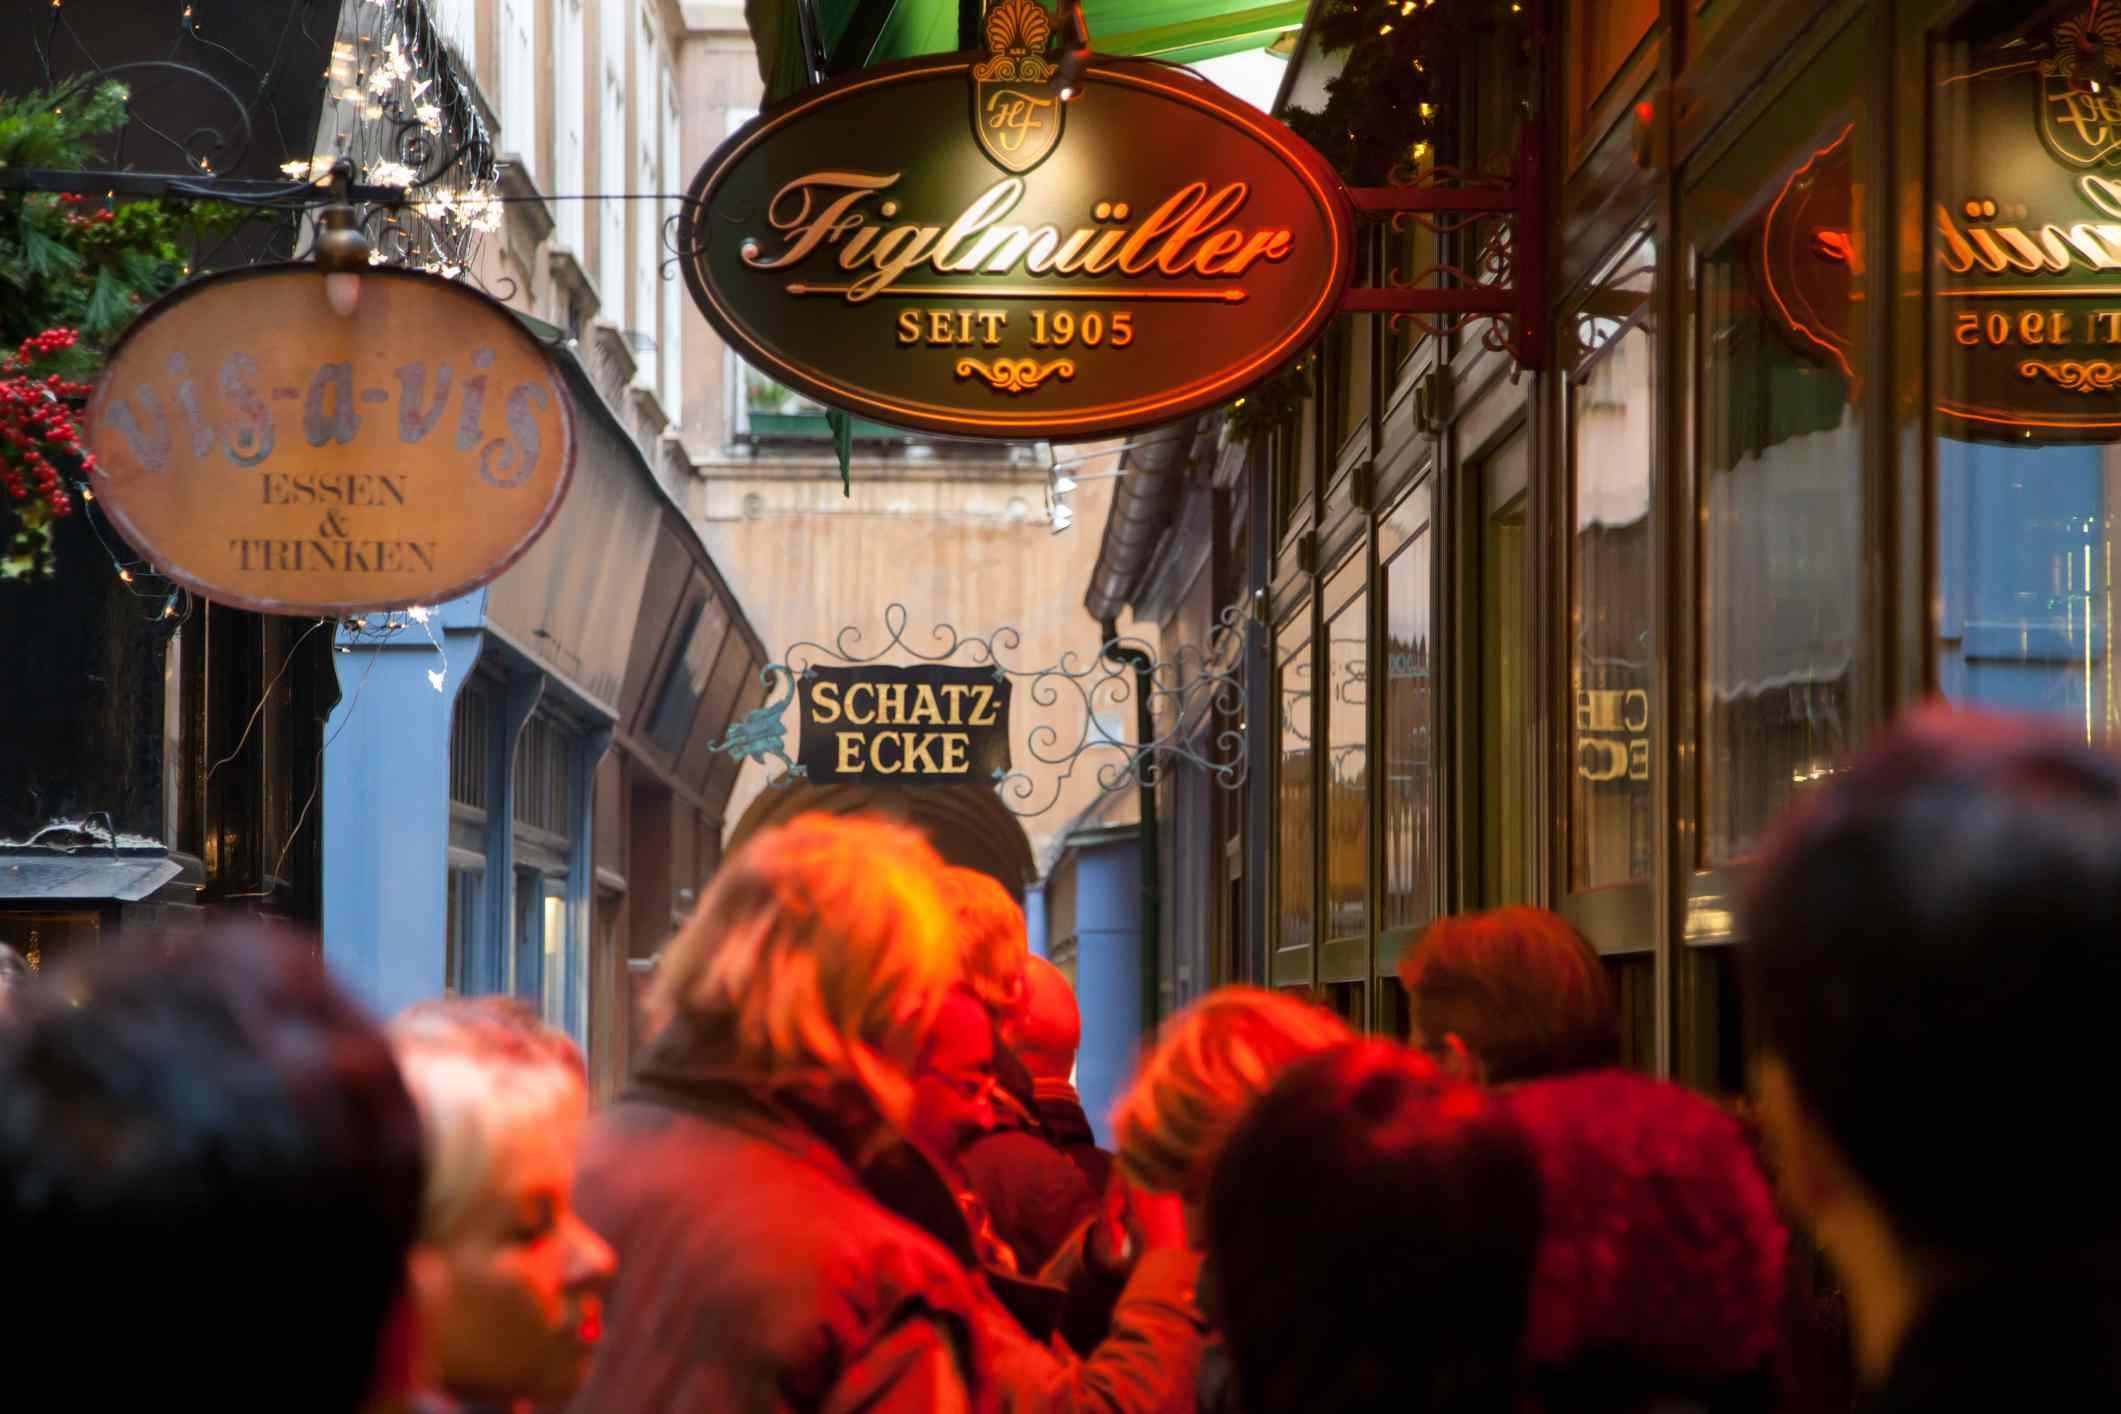 Figlmueller Vienna más famoso restaurante Wiener Schnitzel , Austria